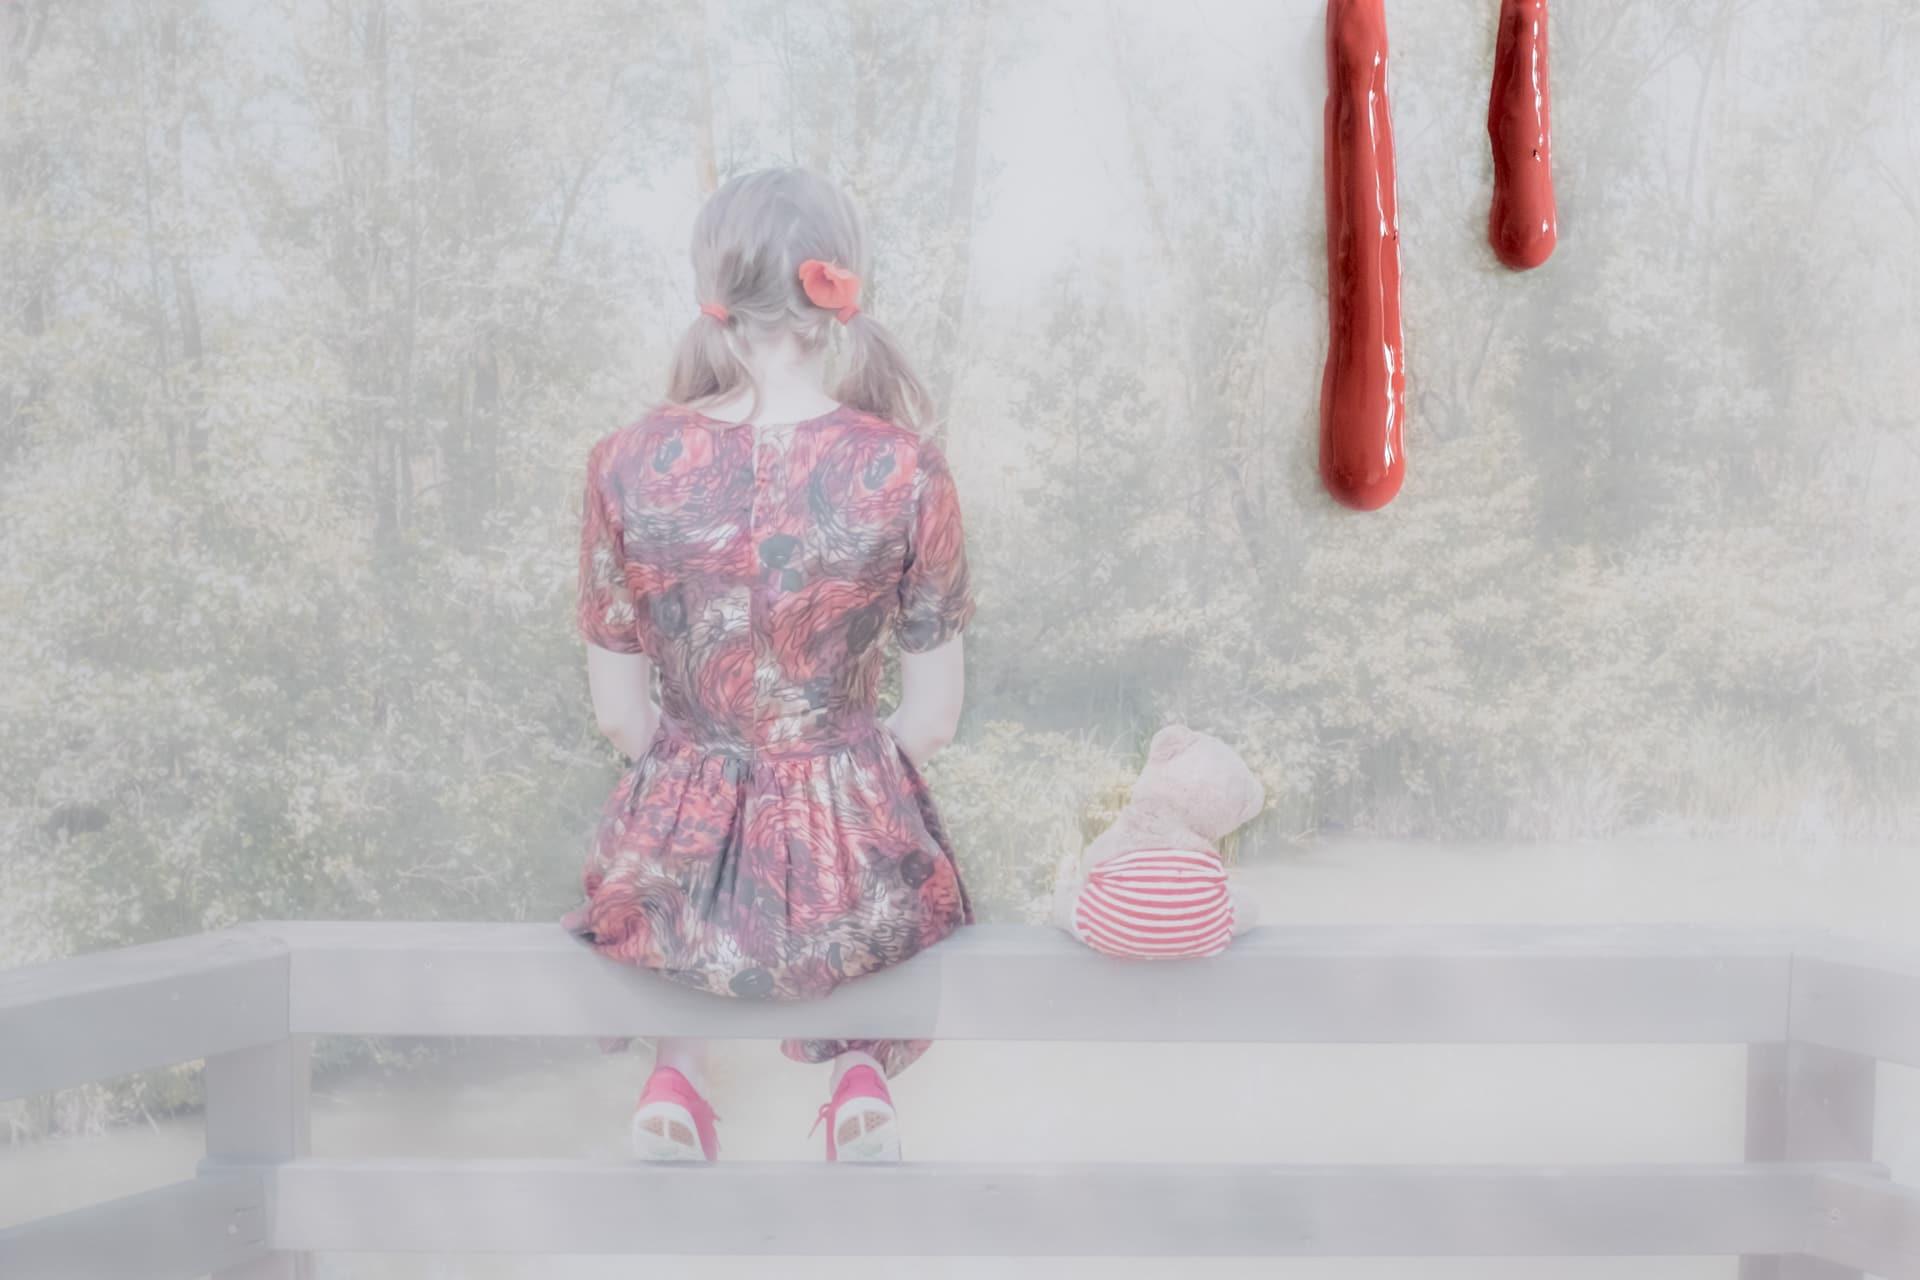 Fog-and-memories-1